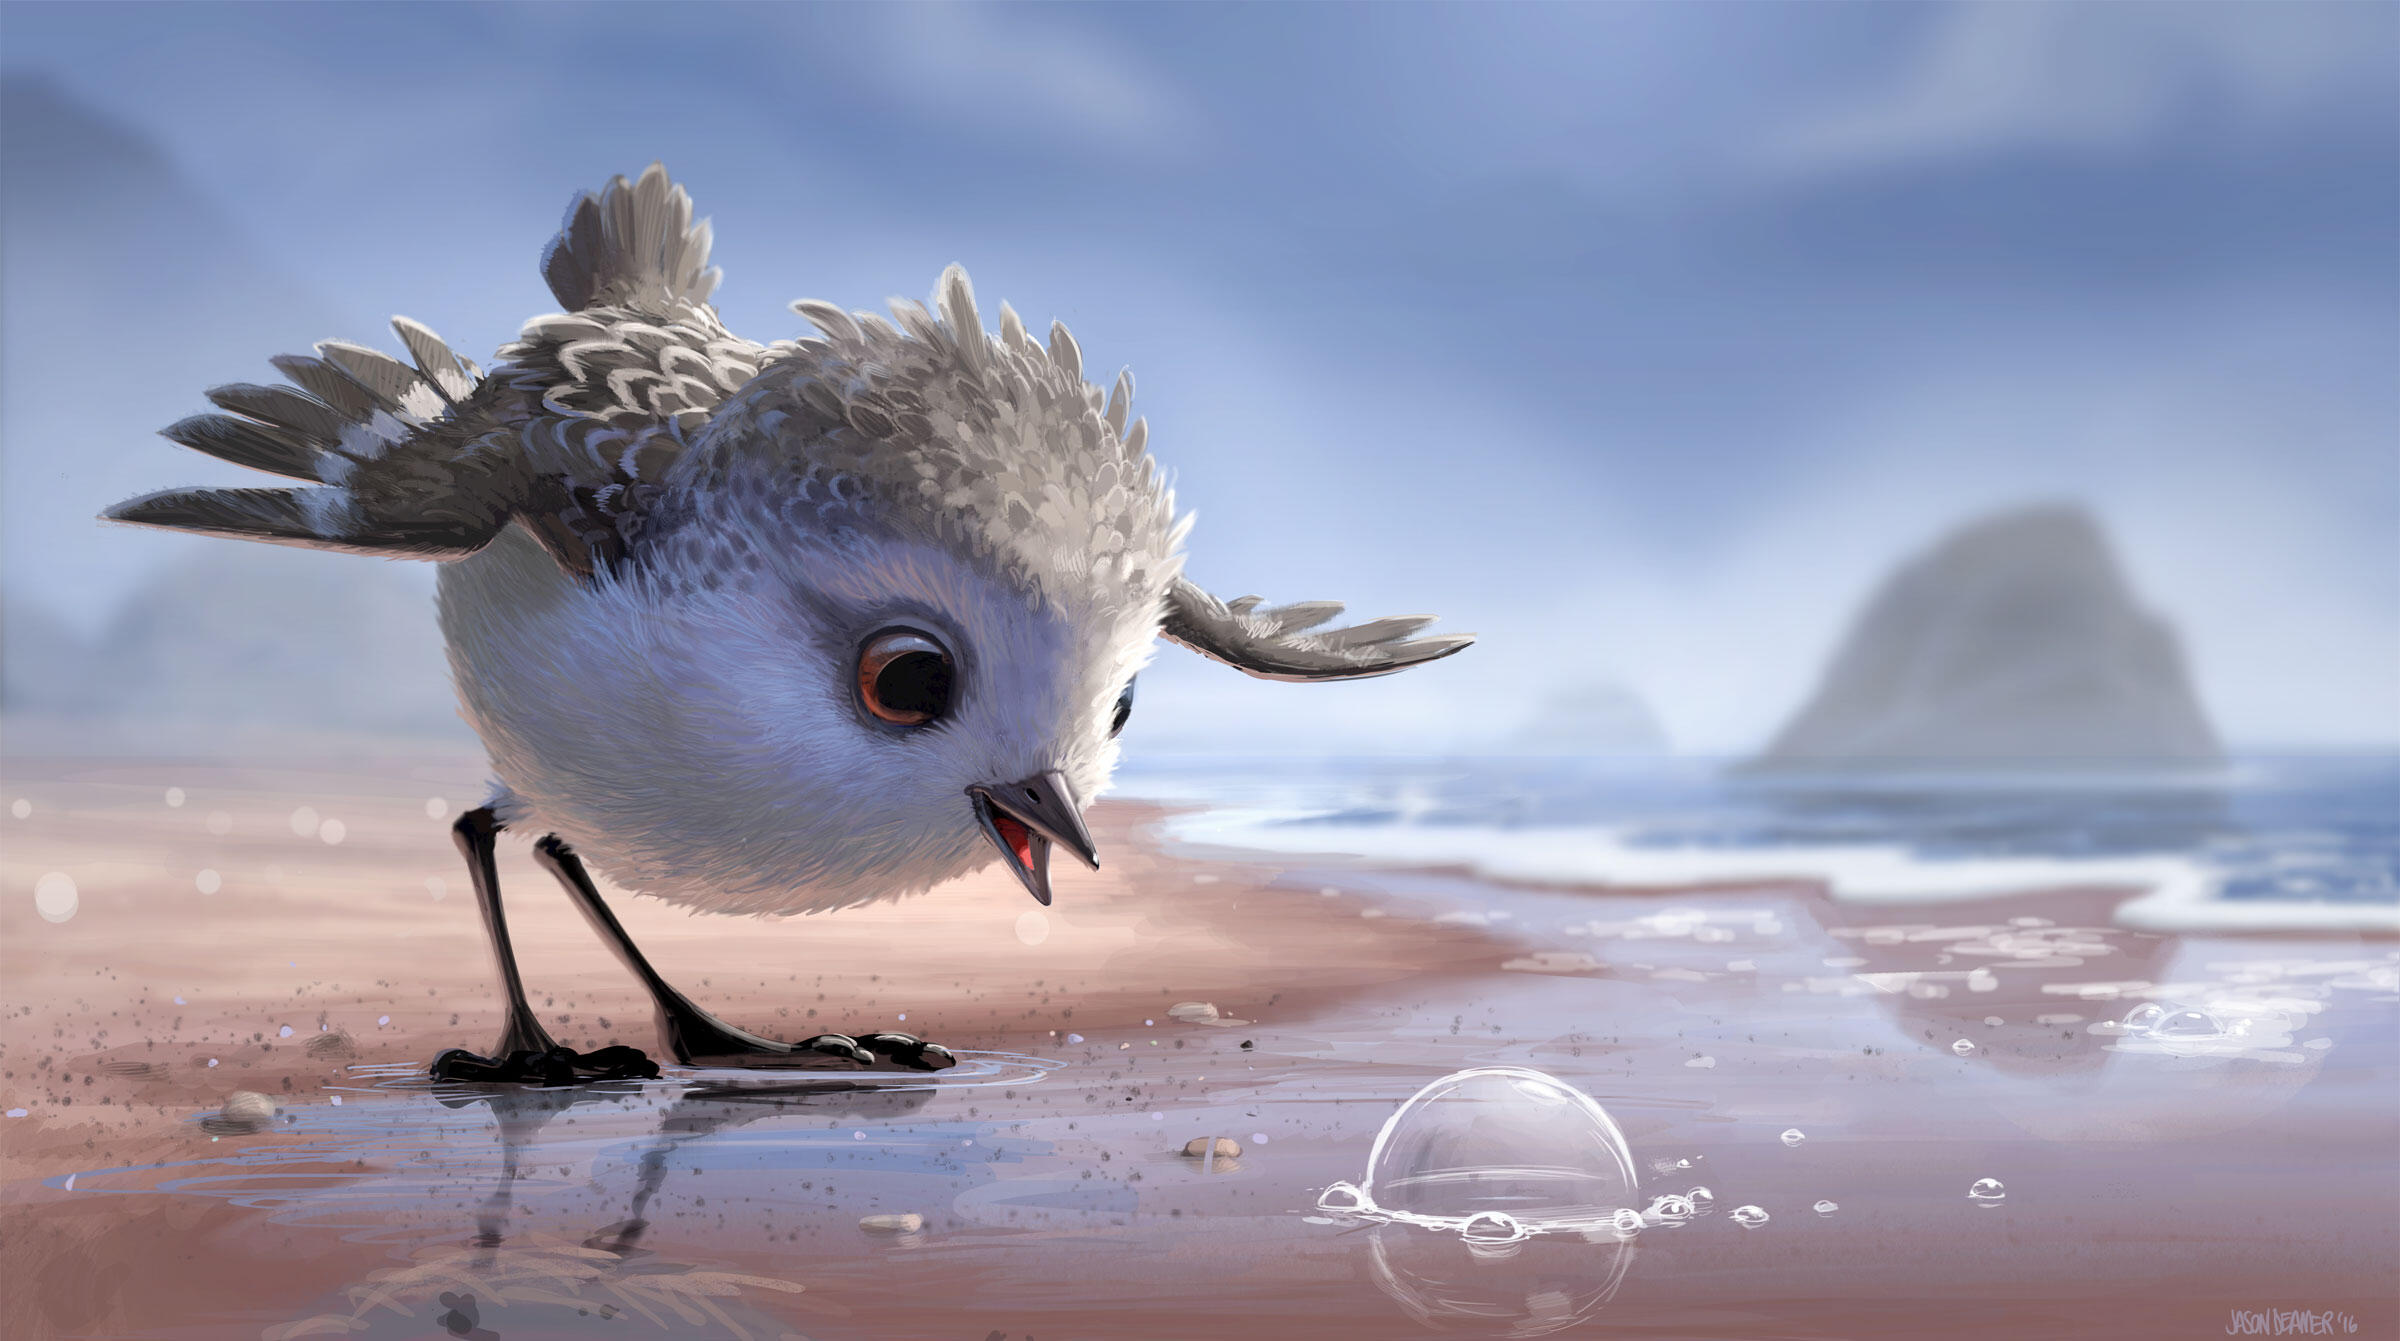 Our hero, Piper the sandpiper. Image: Disney•Pixar